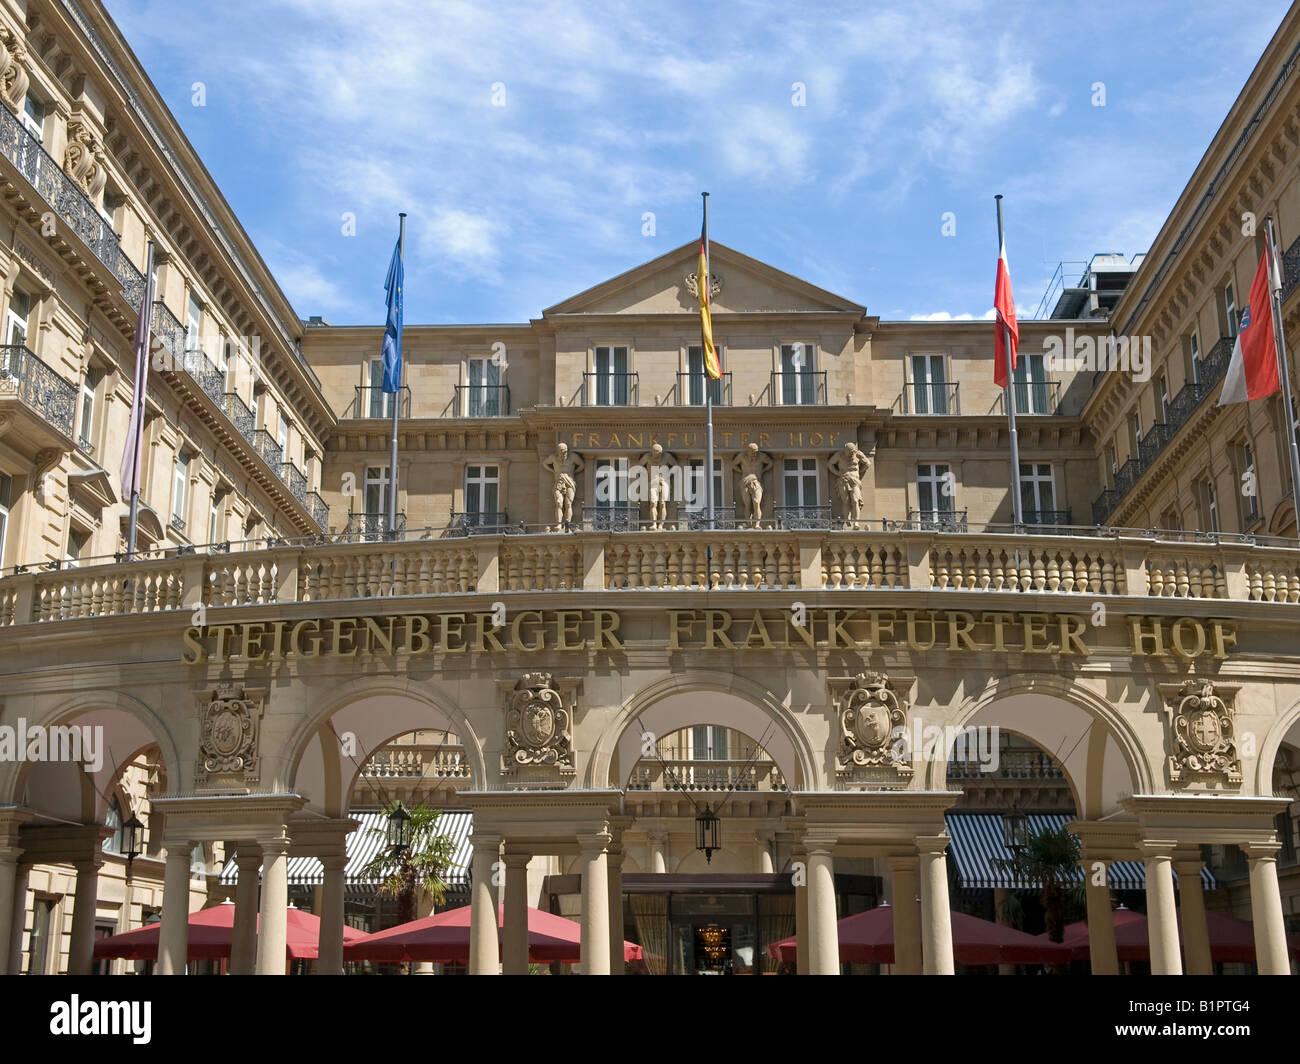 hotel luxus class Steigenberger Frankfurter Hof with facade storefront in Wilhelminian style in Frankfurt am Main - Stock Image